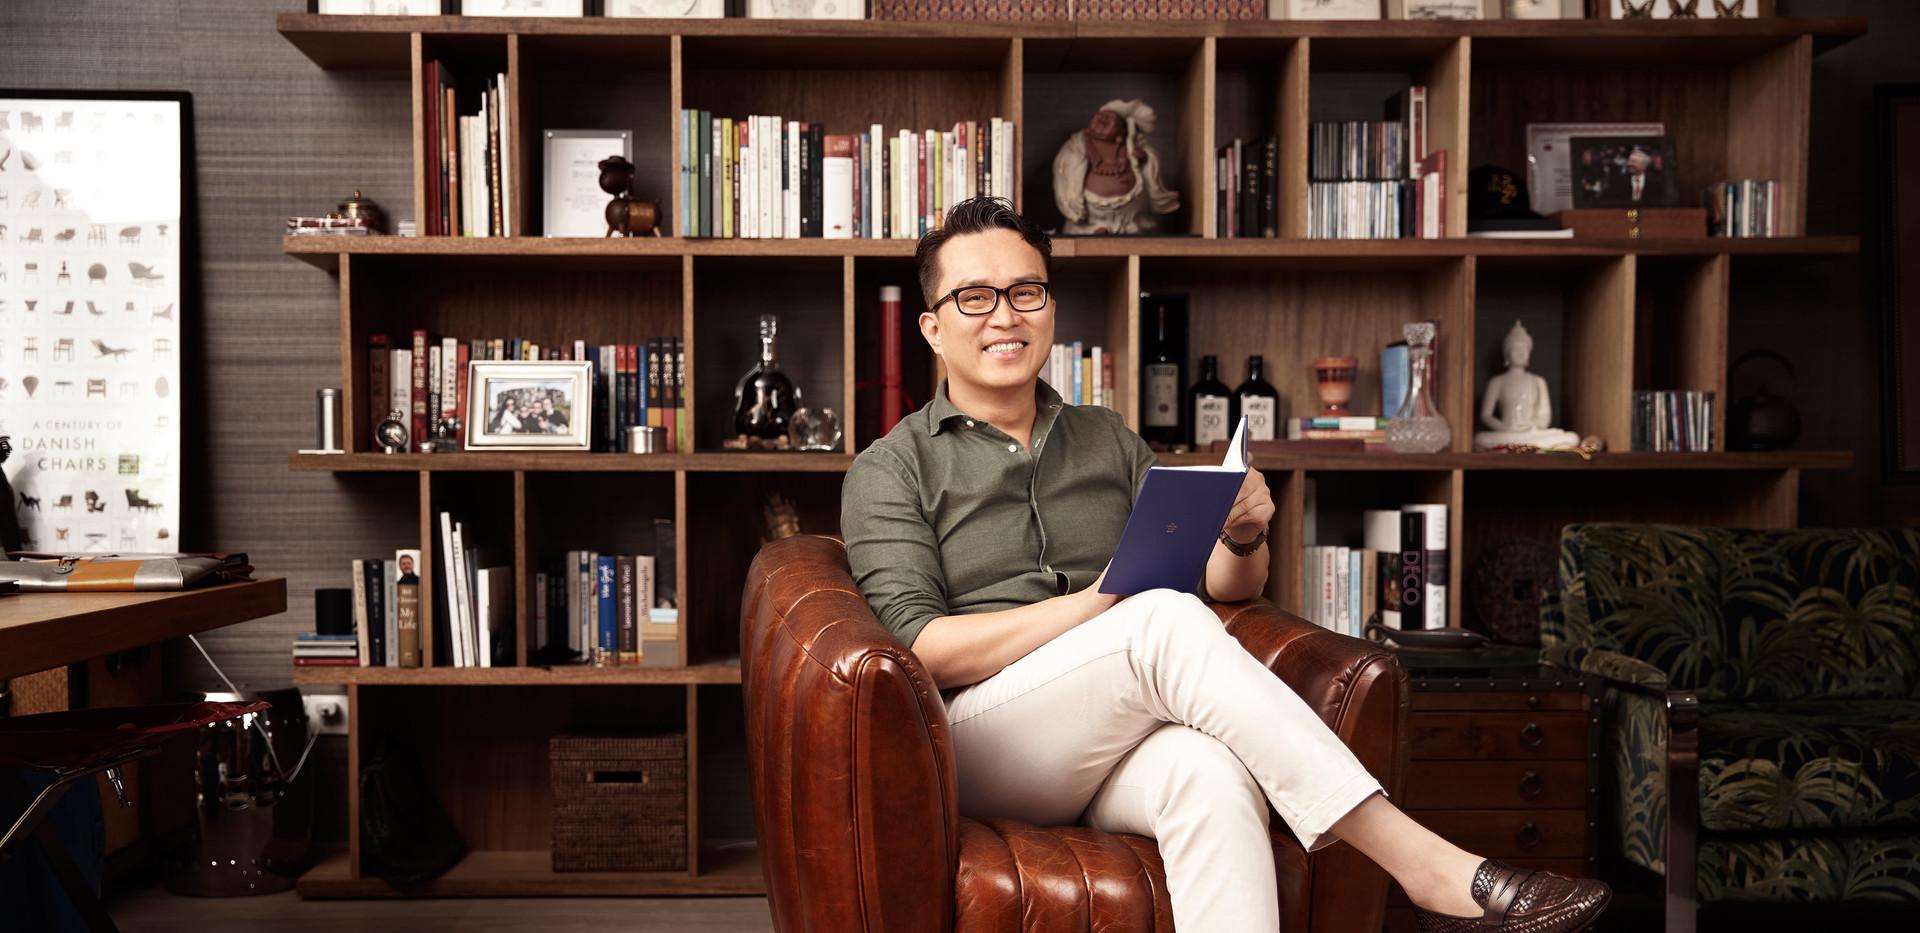 Interior designer portrait office Shangh